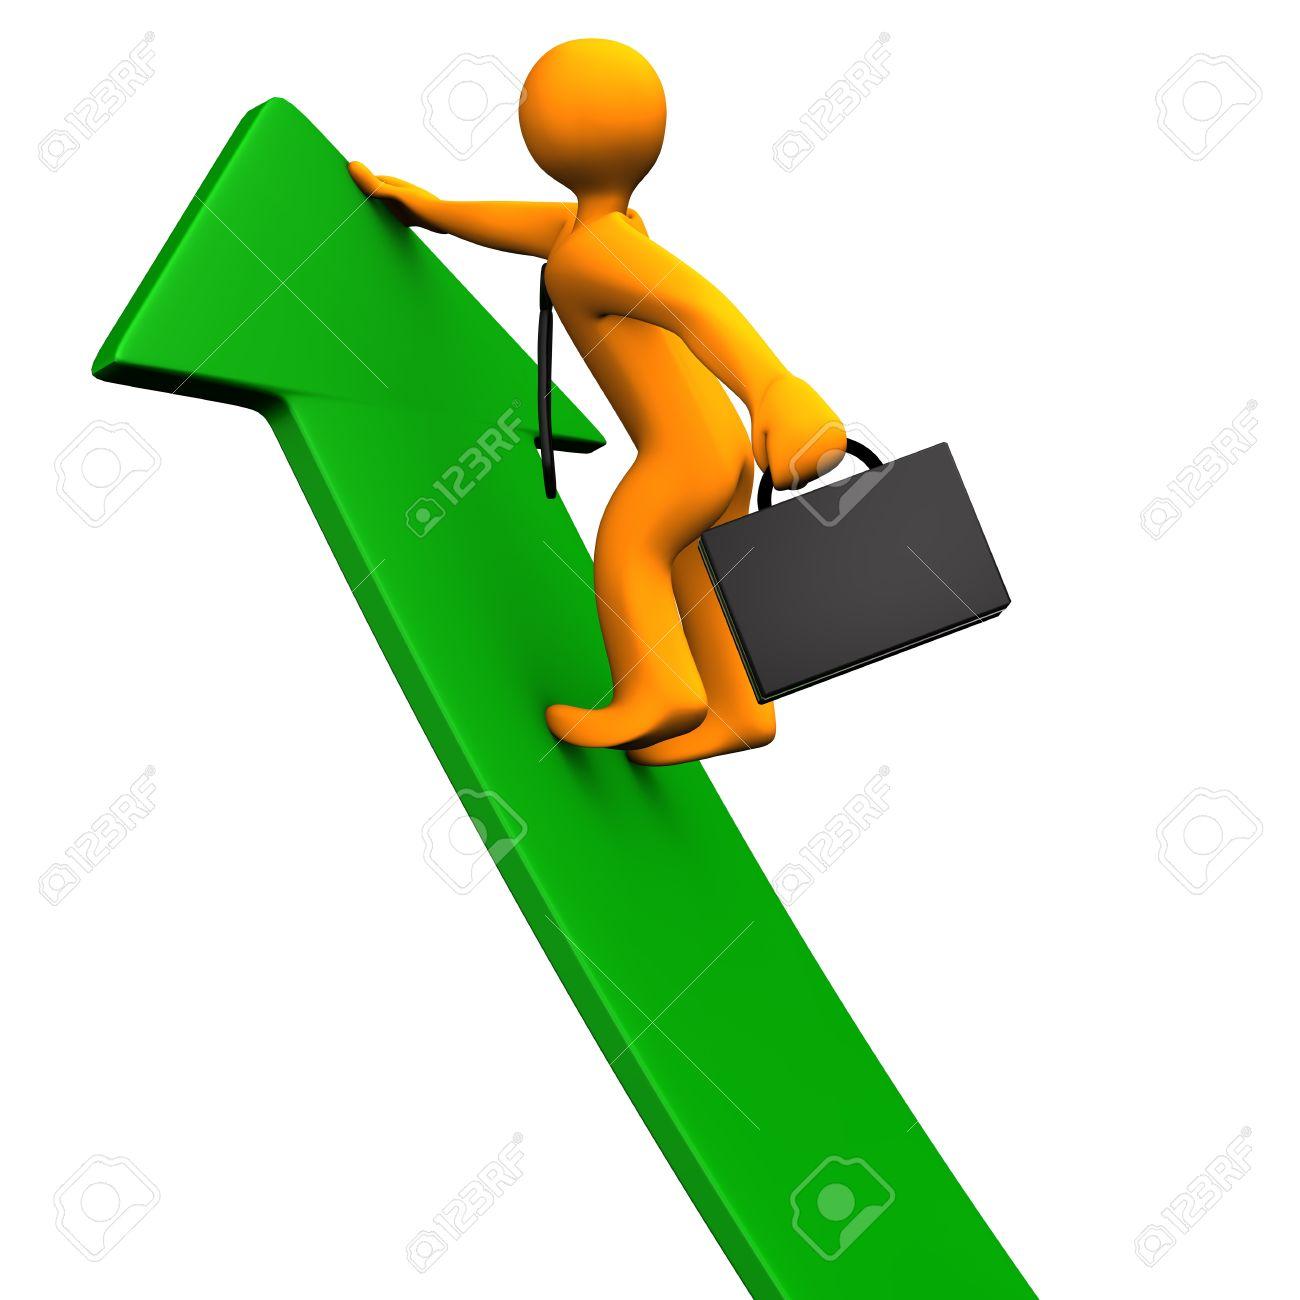 Orange cartoon character climbs on the green arrow. White background. Stock Photo - 15933782